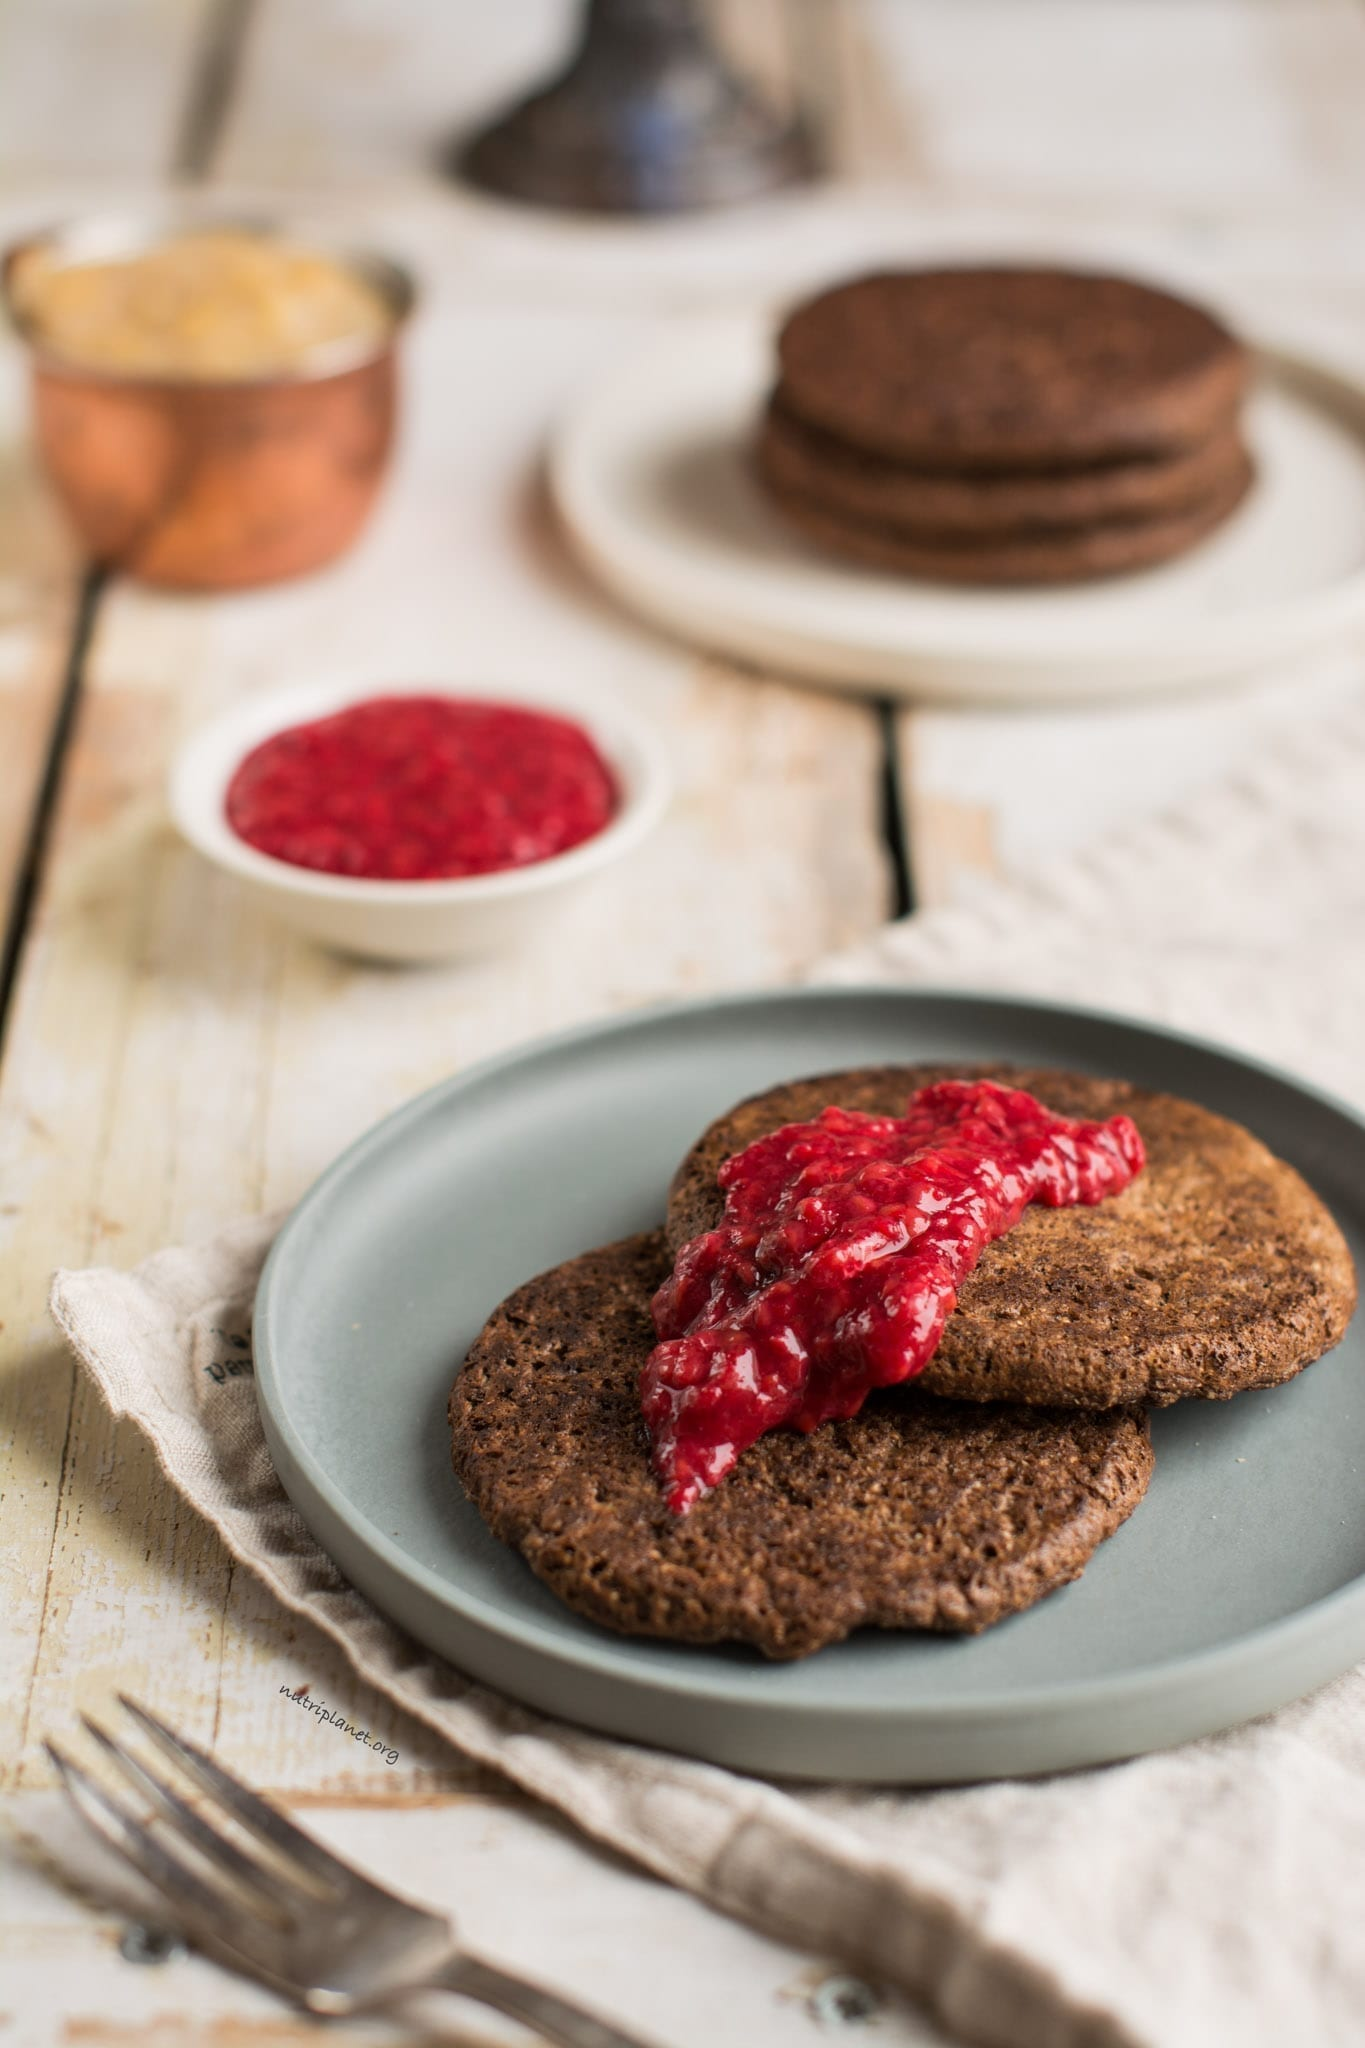 Chocolaty Vegan Gluten-Free Pancakes with Buckwheat Sourdough